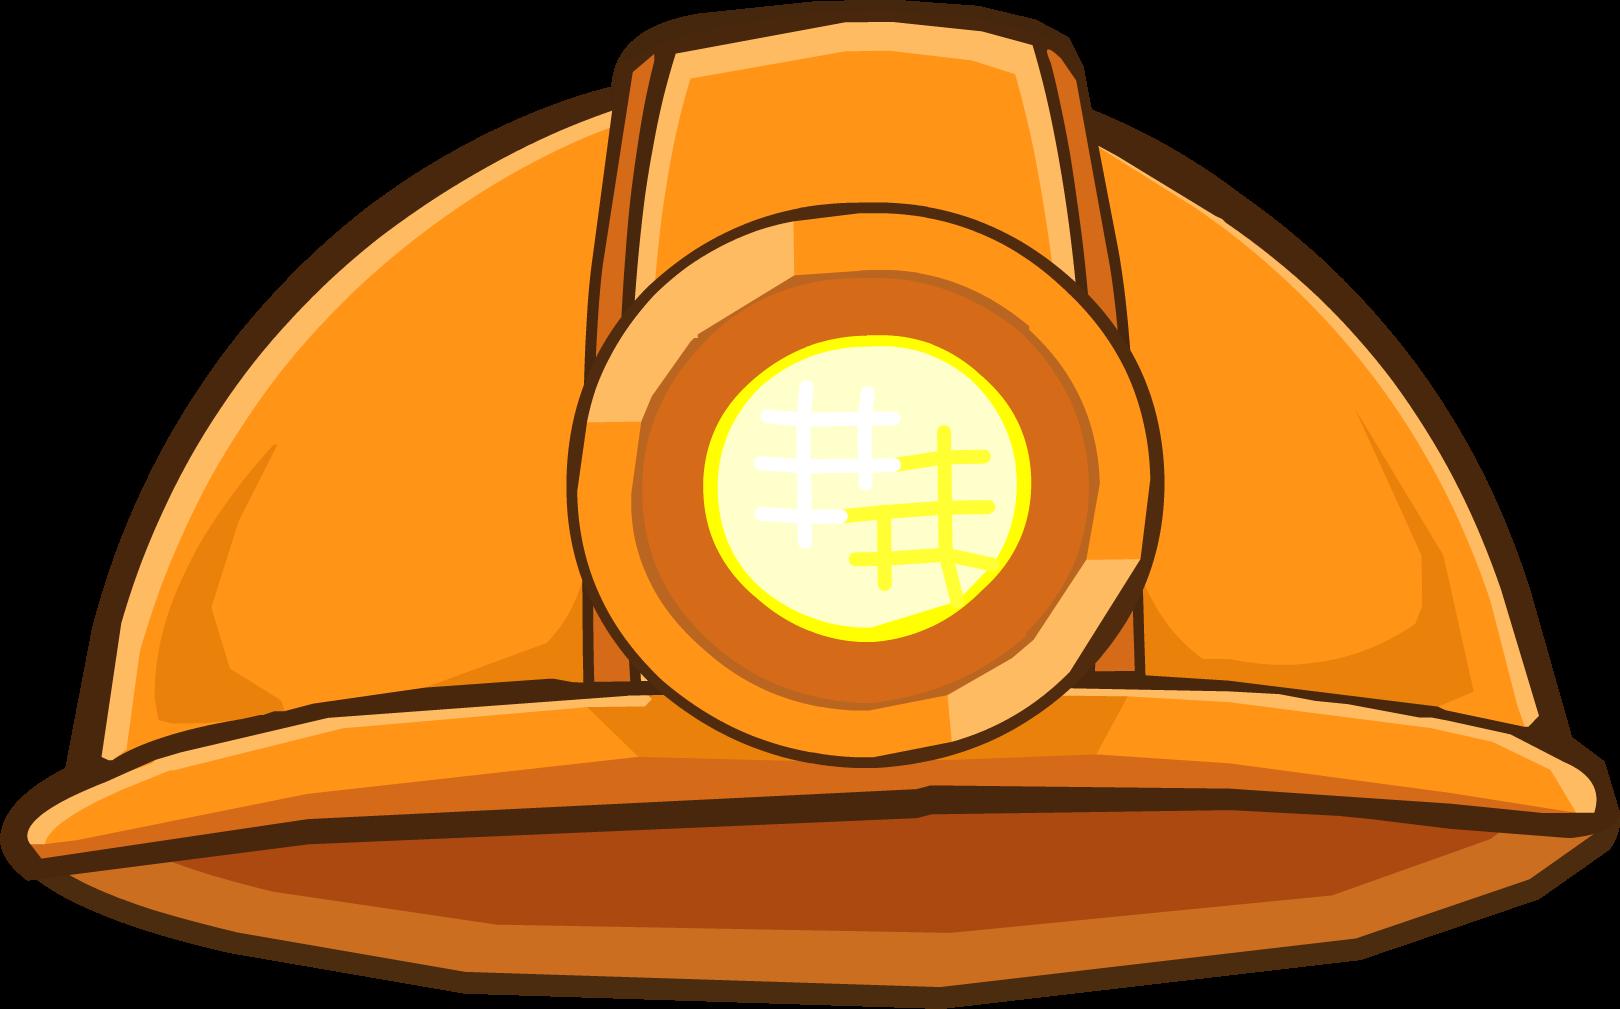 Miner hat clipart clip transparent stock Hats clipart coal miner, Hats coal miner Transparent FREE ... clip transparent stock